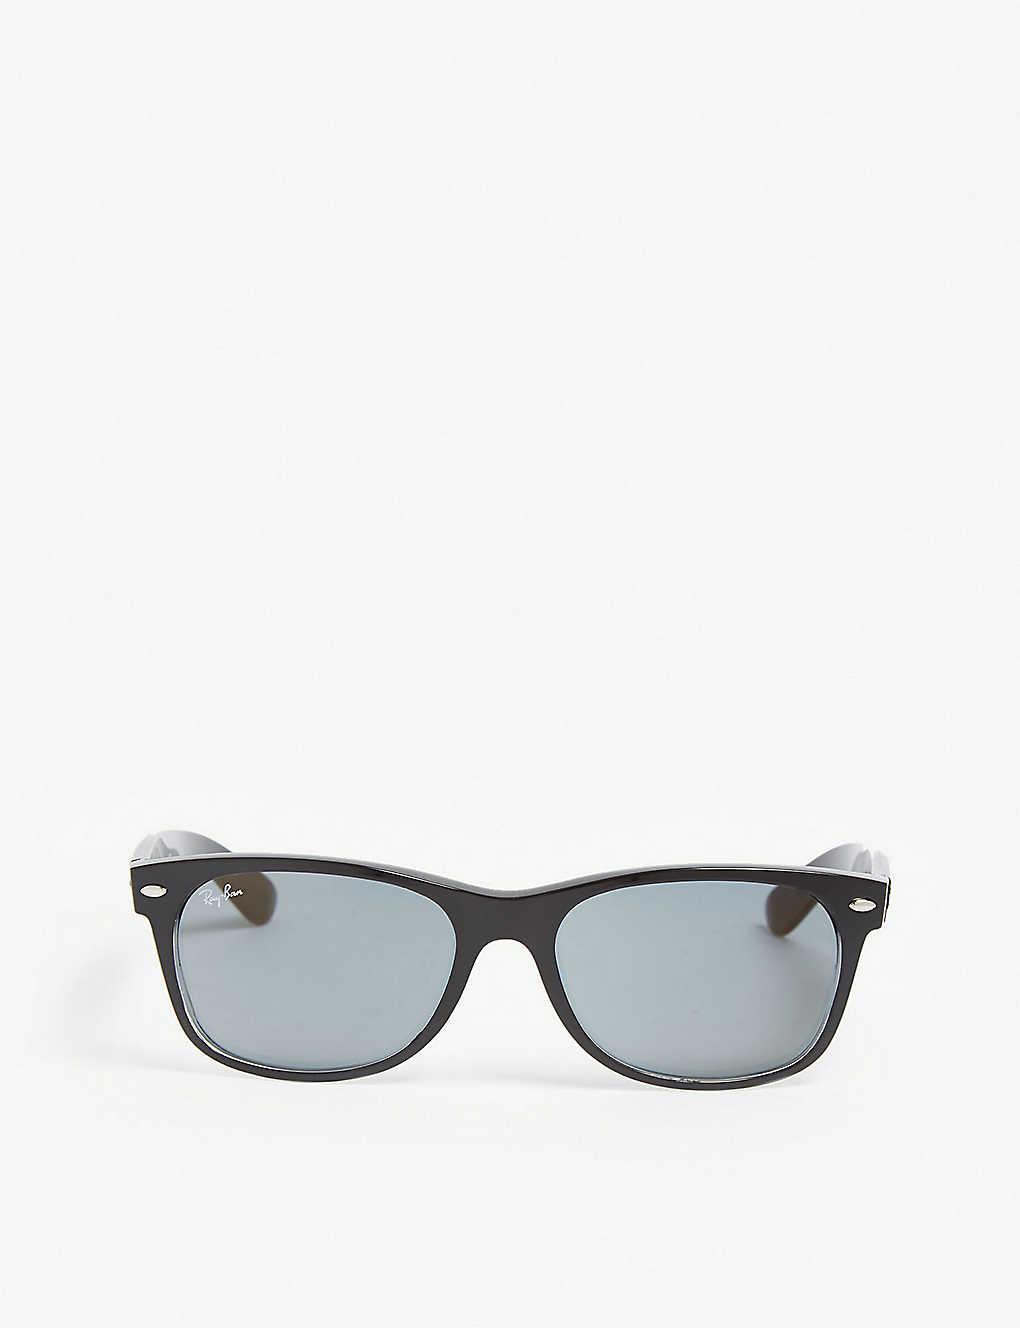 28332f1f66 RB2132 New Wayfarer sunglasses - Black ...